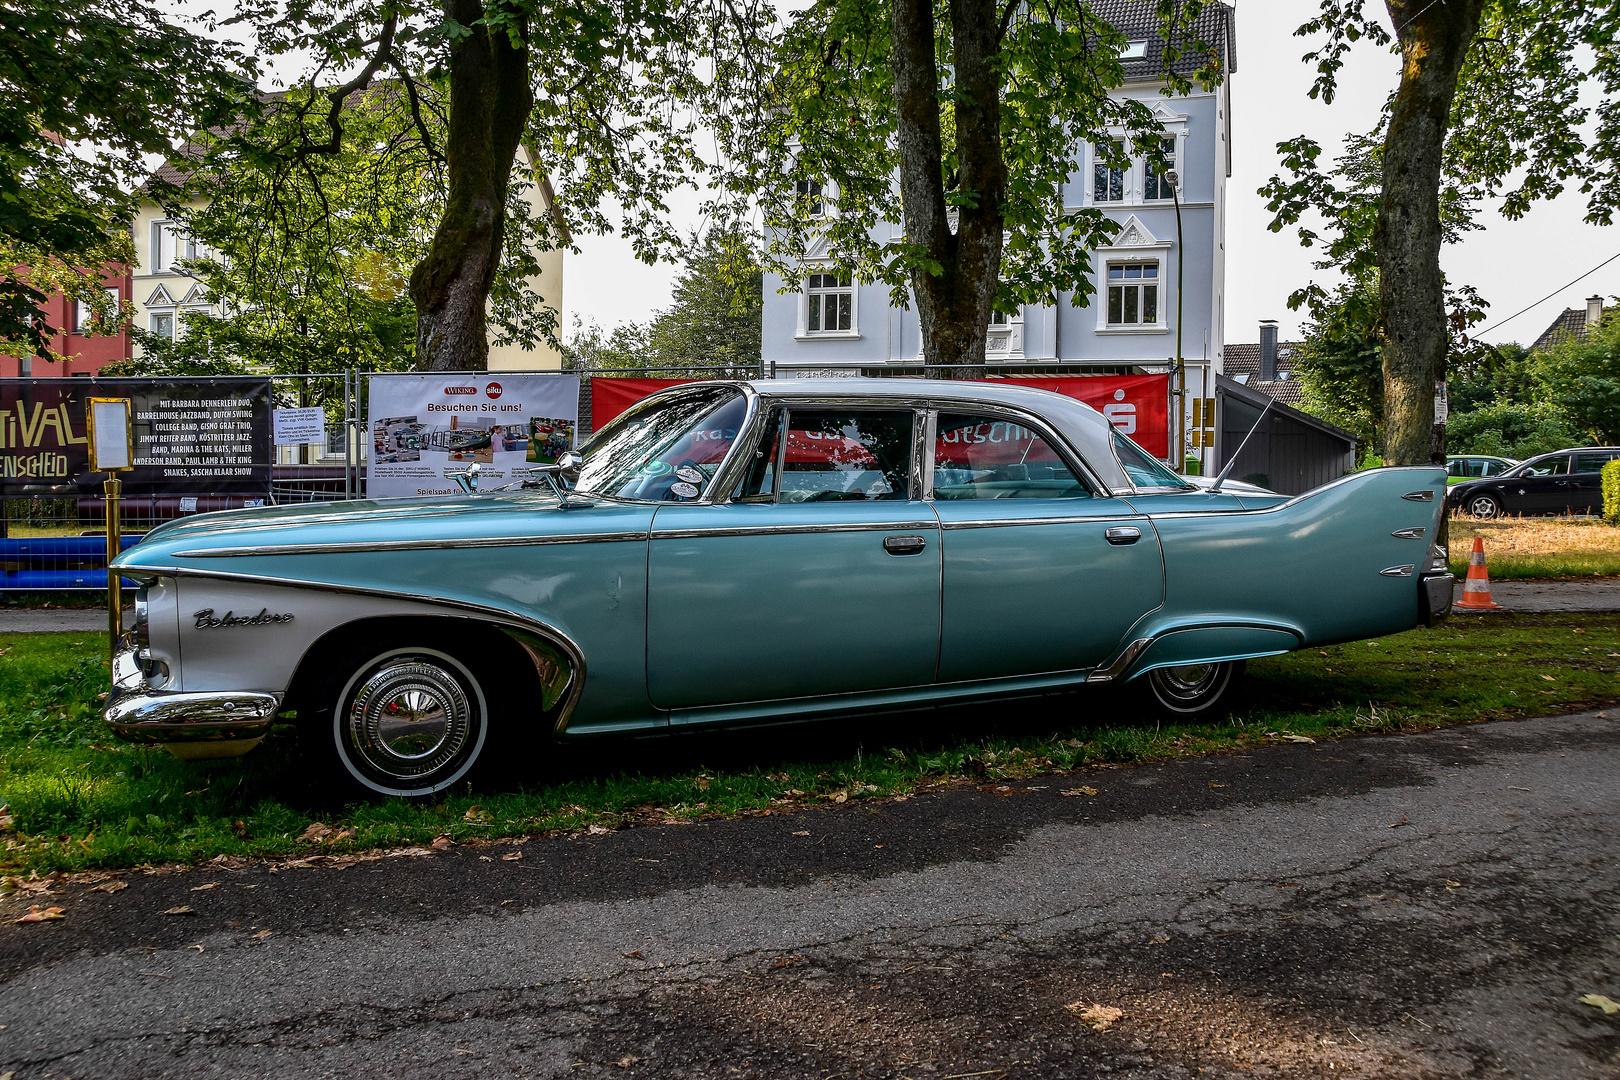 Chrysler Plymouth Belvedere / 4 door Sedan